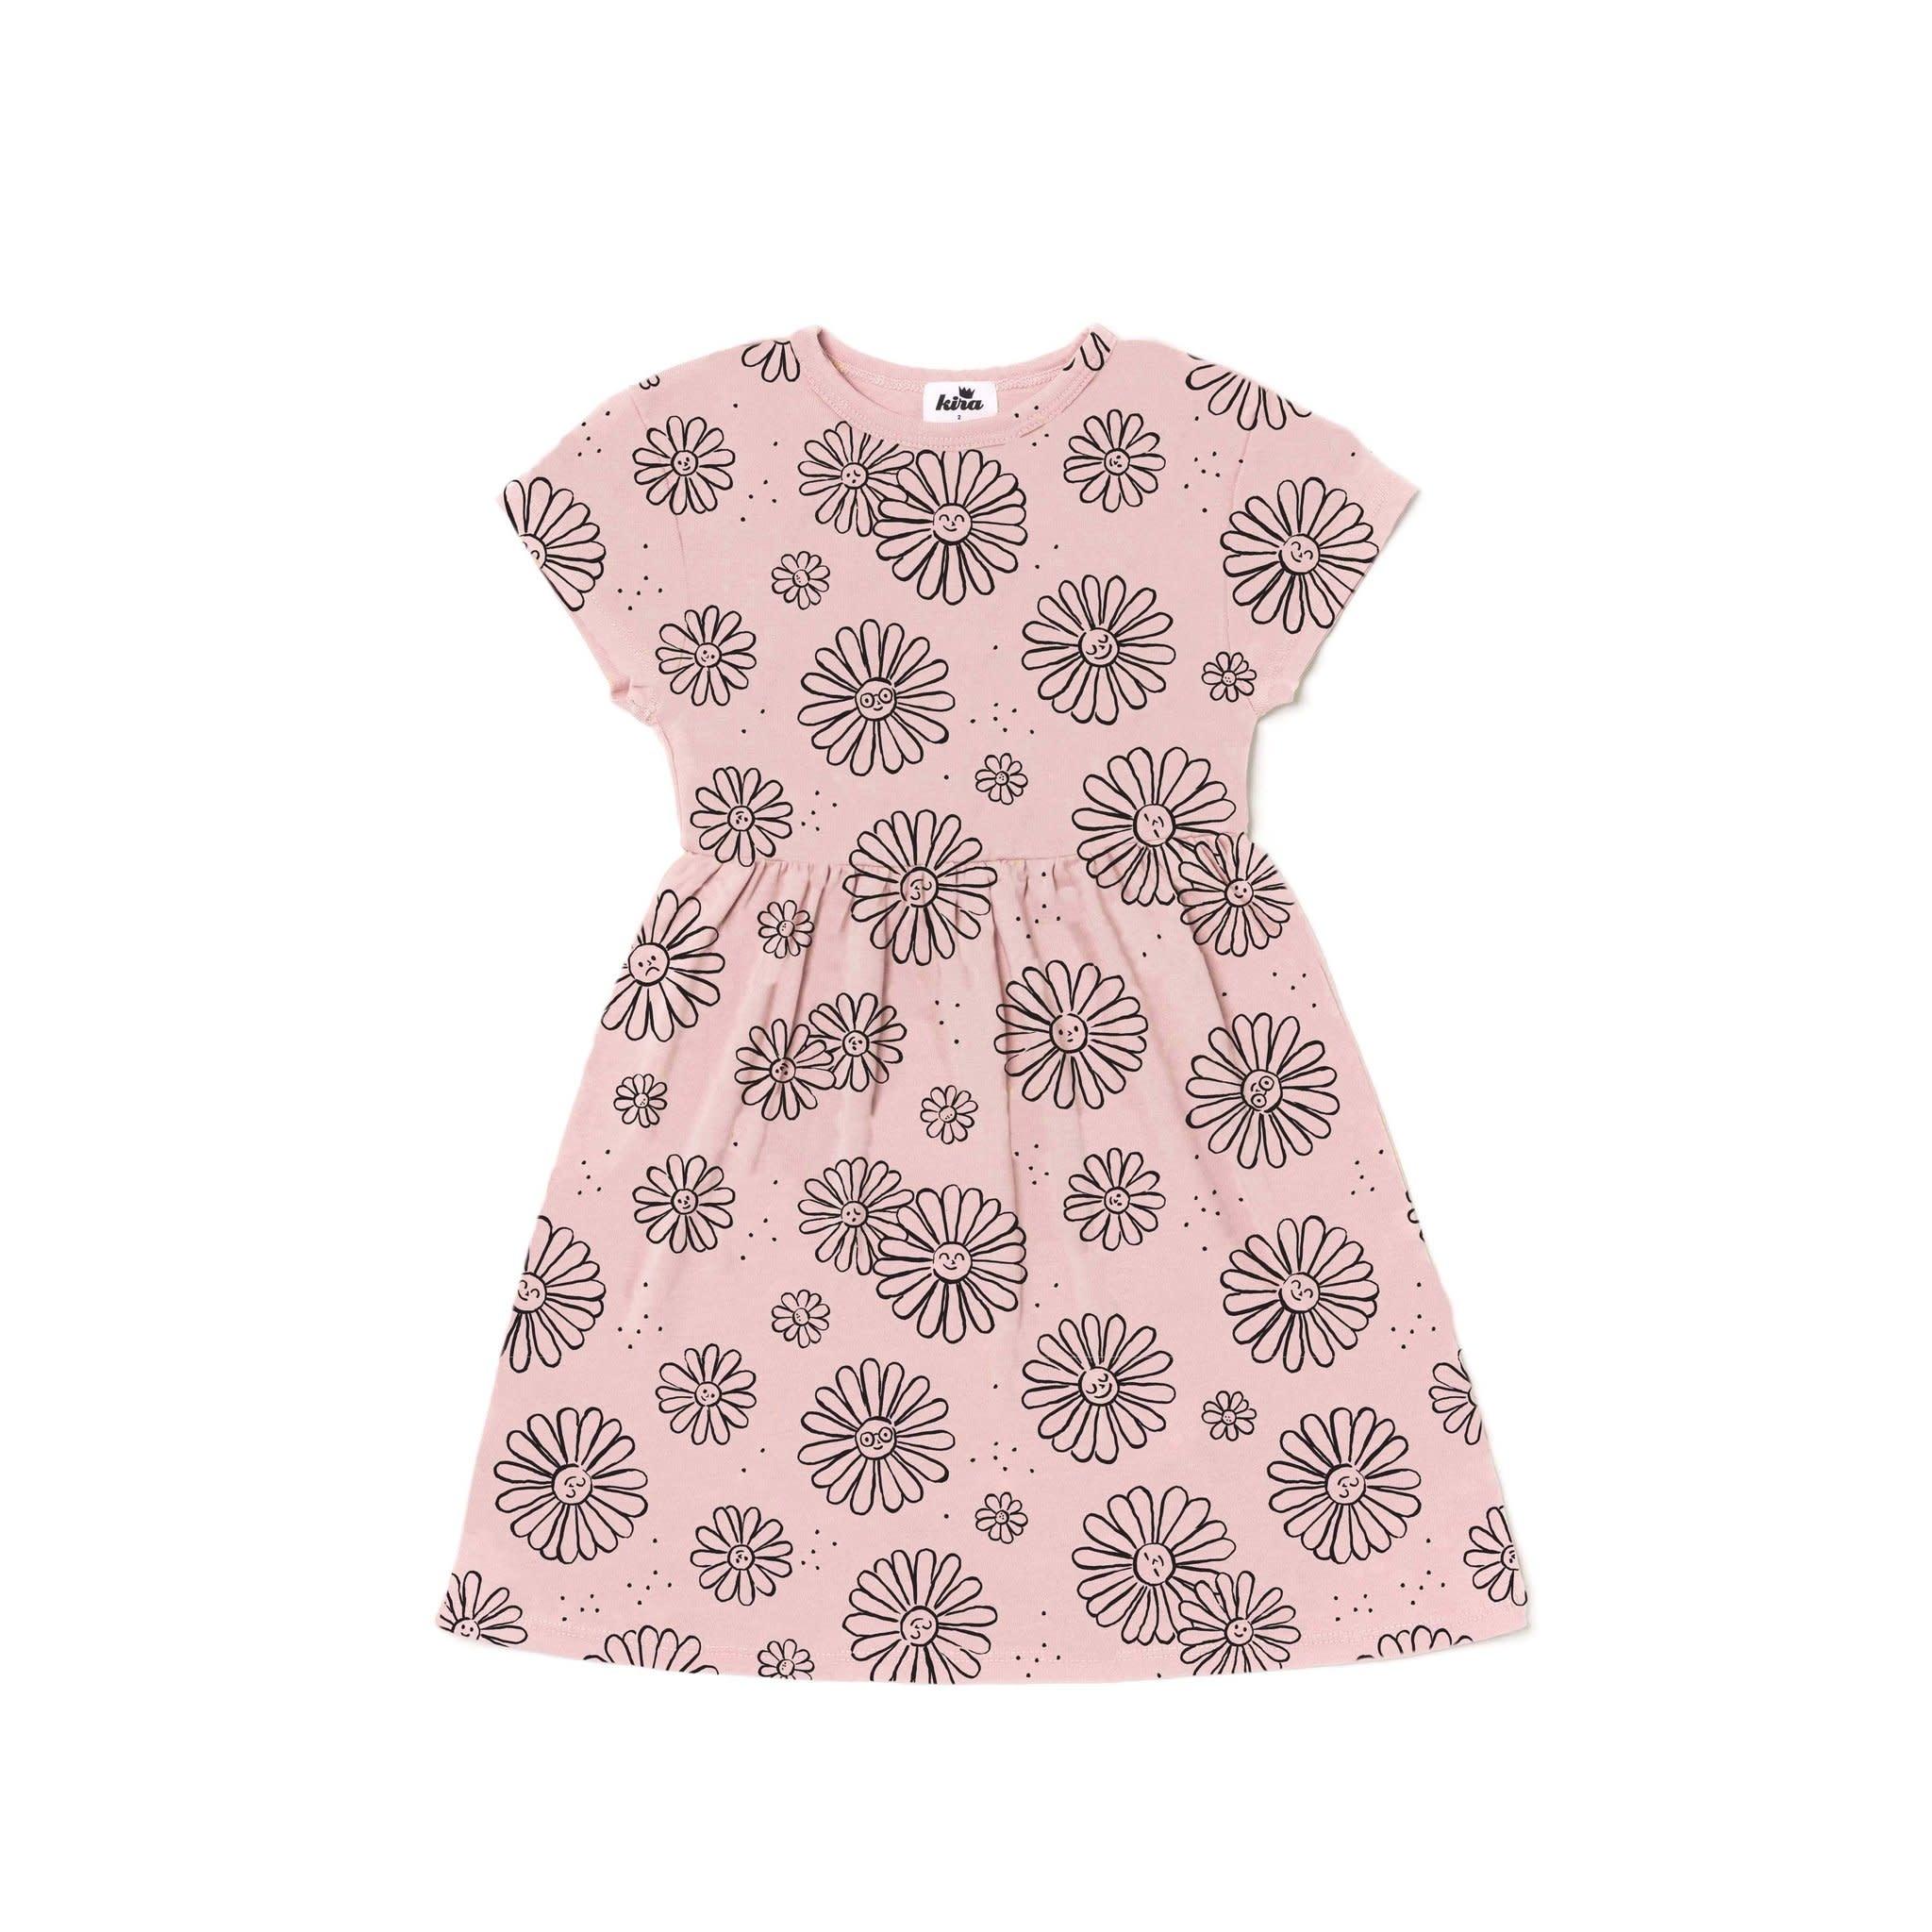 Kira - Daisies Print Baby Doll Dress - Blush